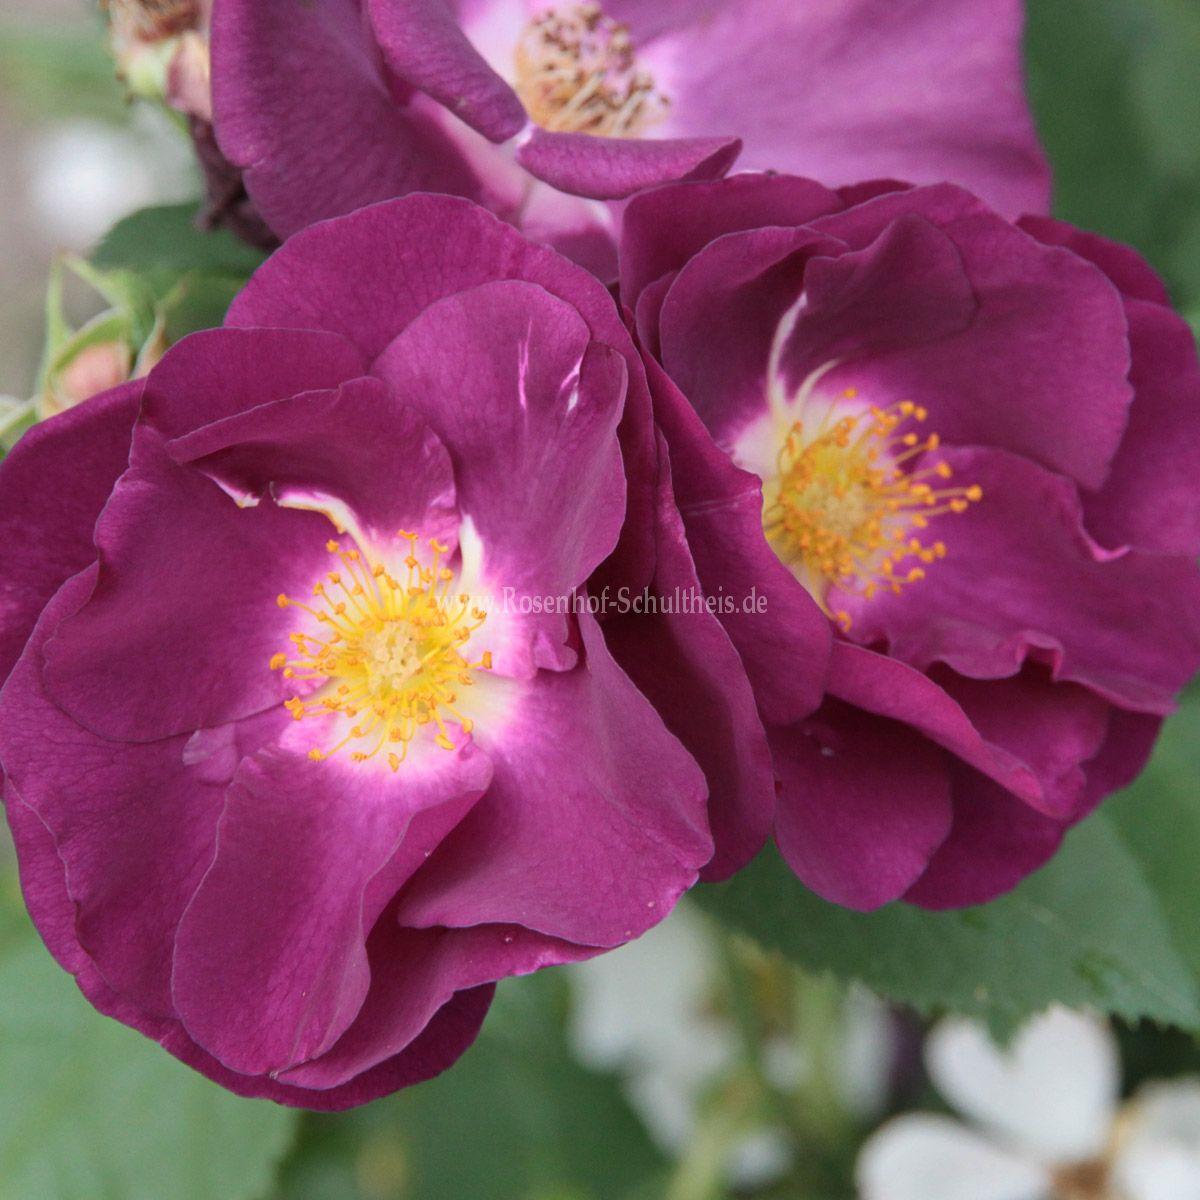 rhapsody in blue rosen online kaufen im rosenhof. Black Bedroom Furniture Sets. Home Design Ideas